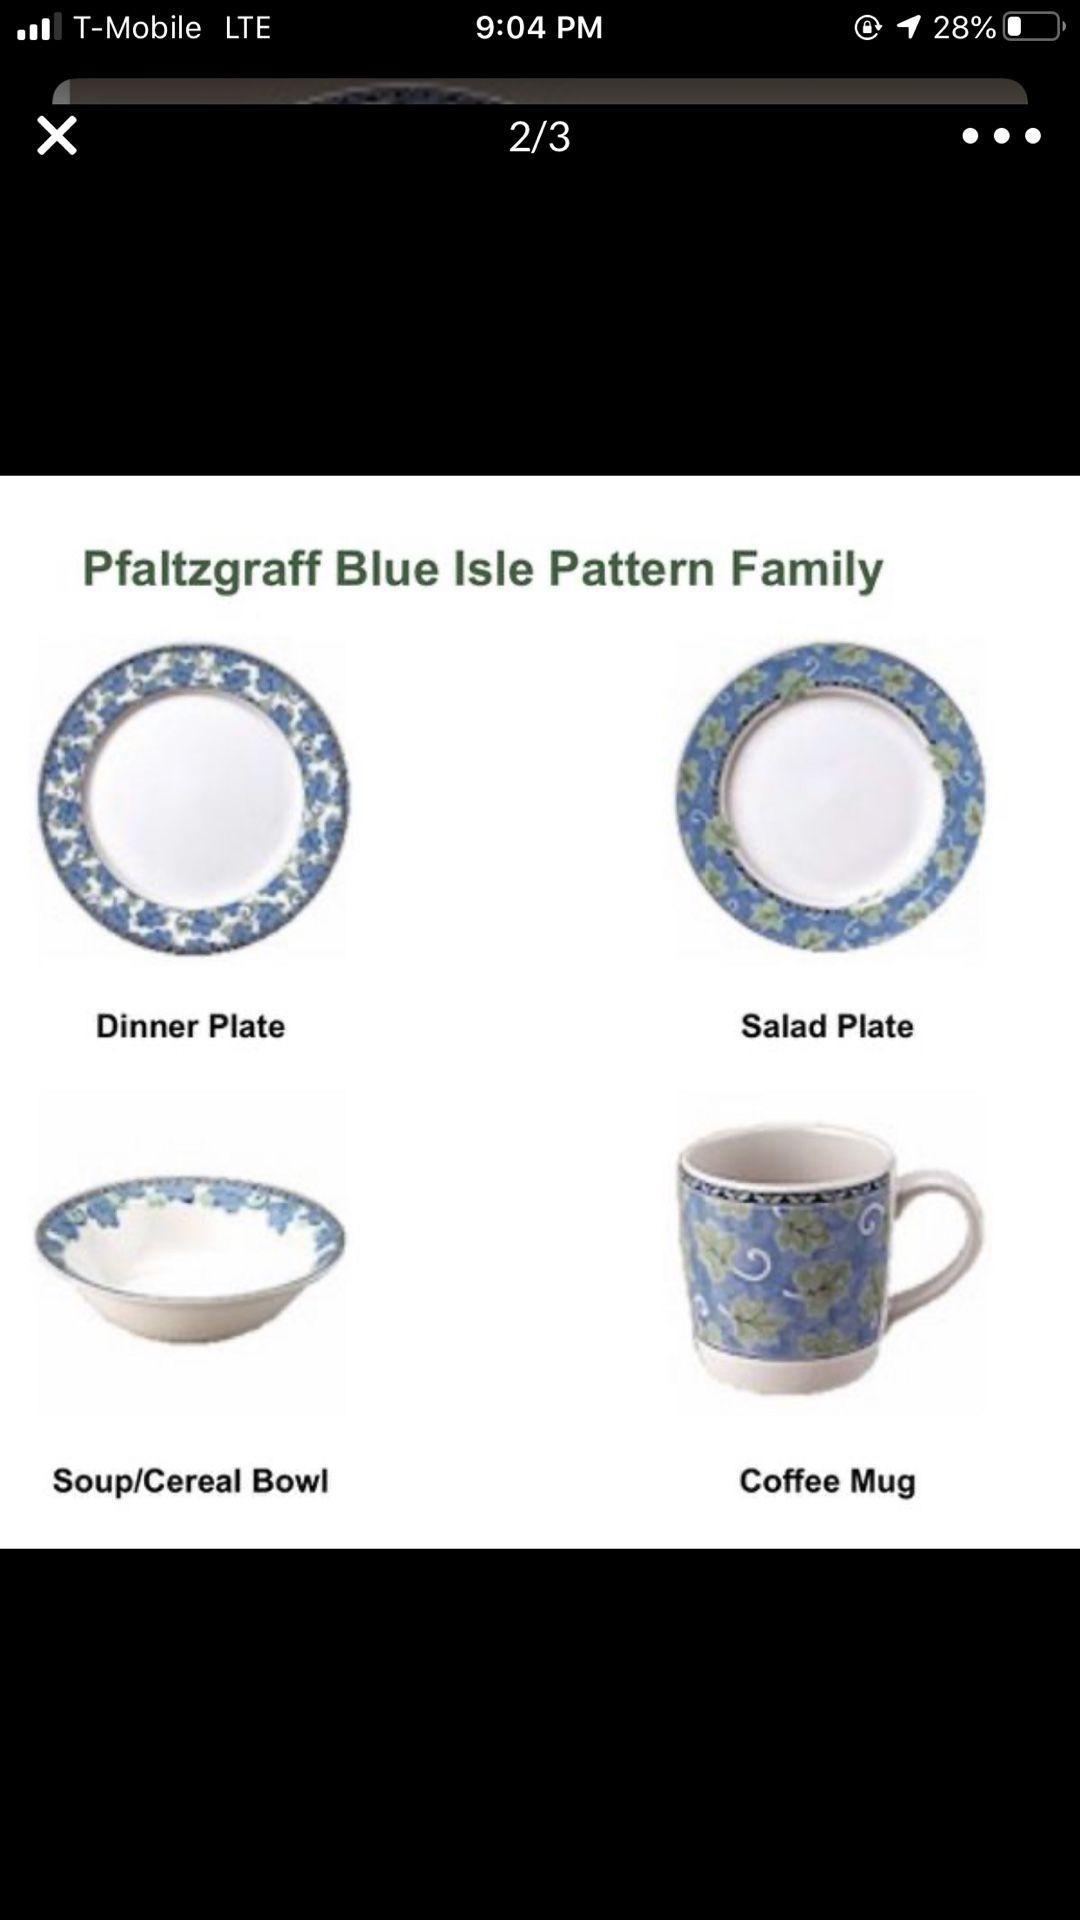 Pfaltzgraff complete set 12 plates/12 cups/12 bowls/several serving plates